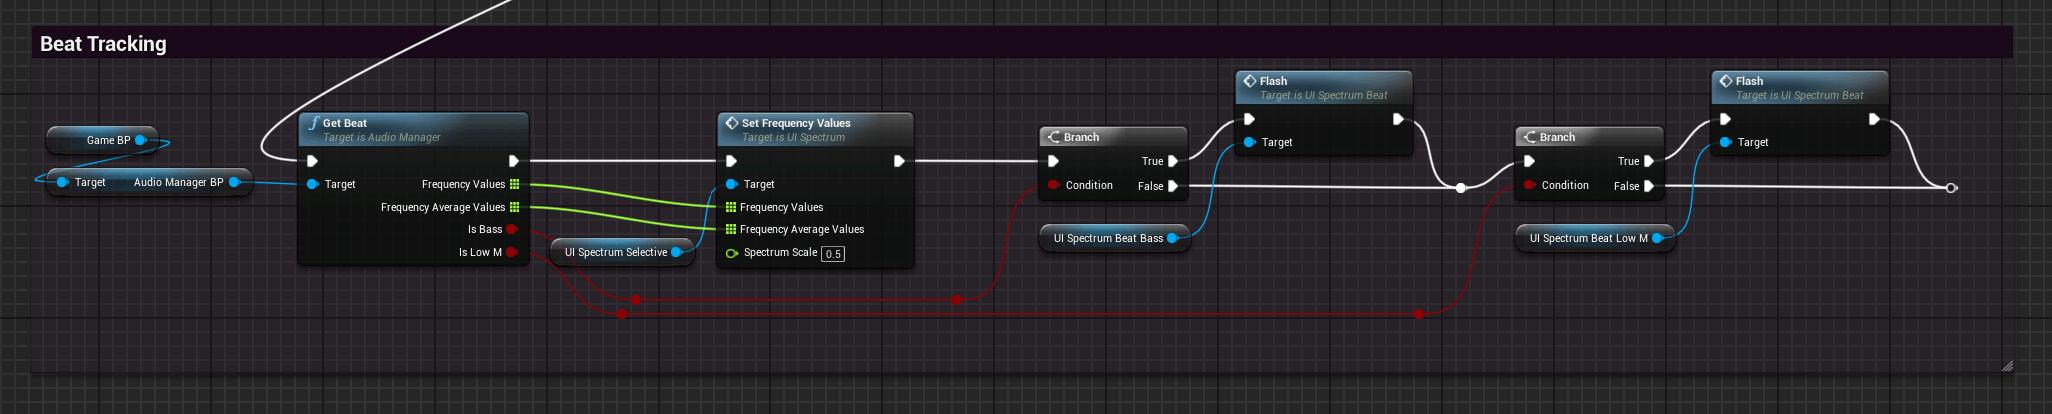 UI_Display_Update_beat